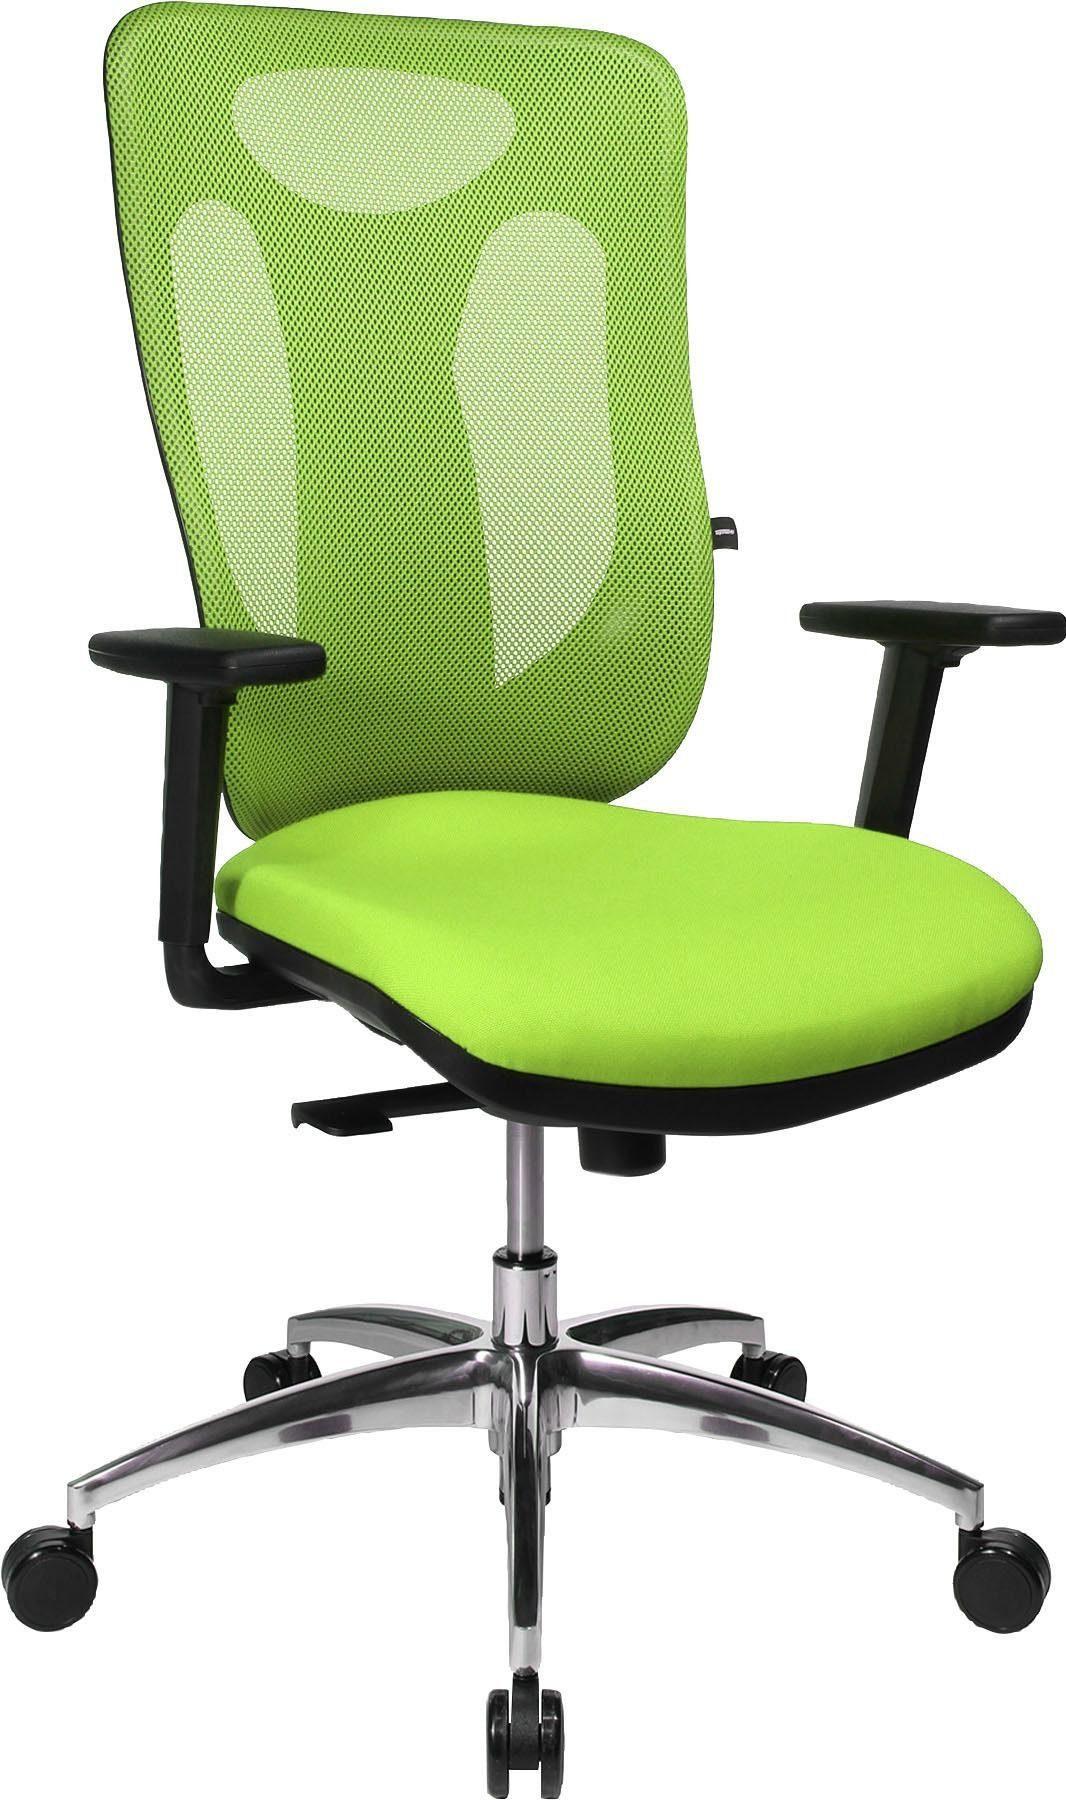 TOPSTAR Drehstuhl »Sitness Net Pro 100« kaufen   OTTO